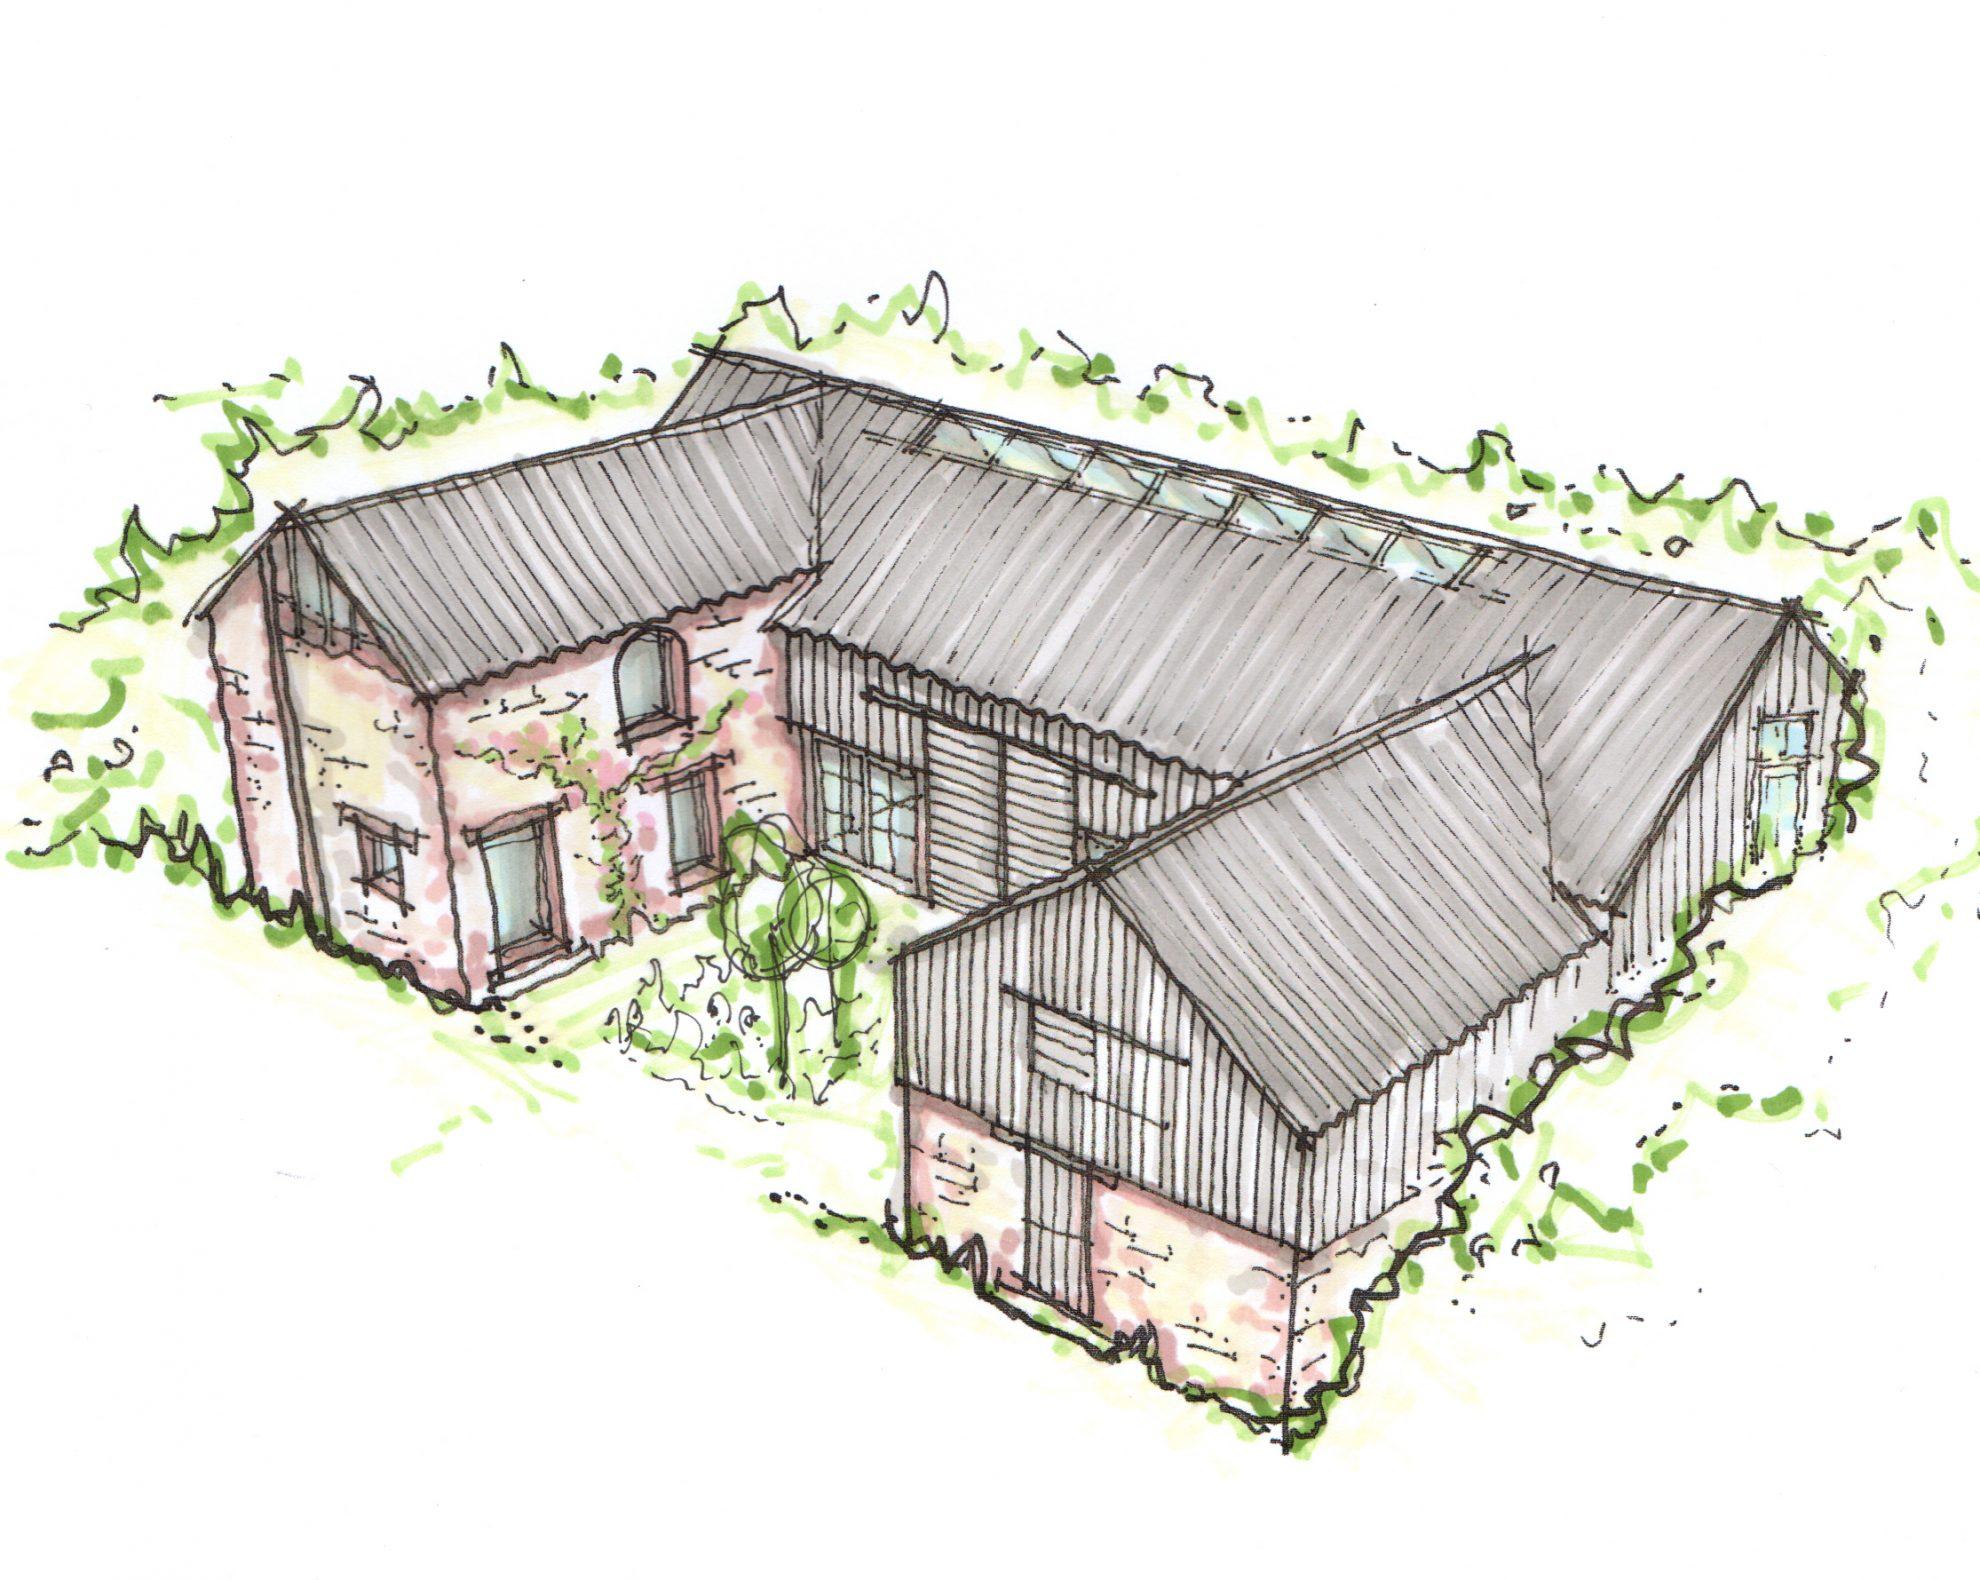 Mylor Farm barn renovation plan - residential architects in Cornwall, Truro